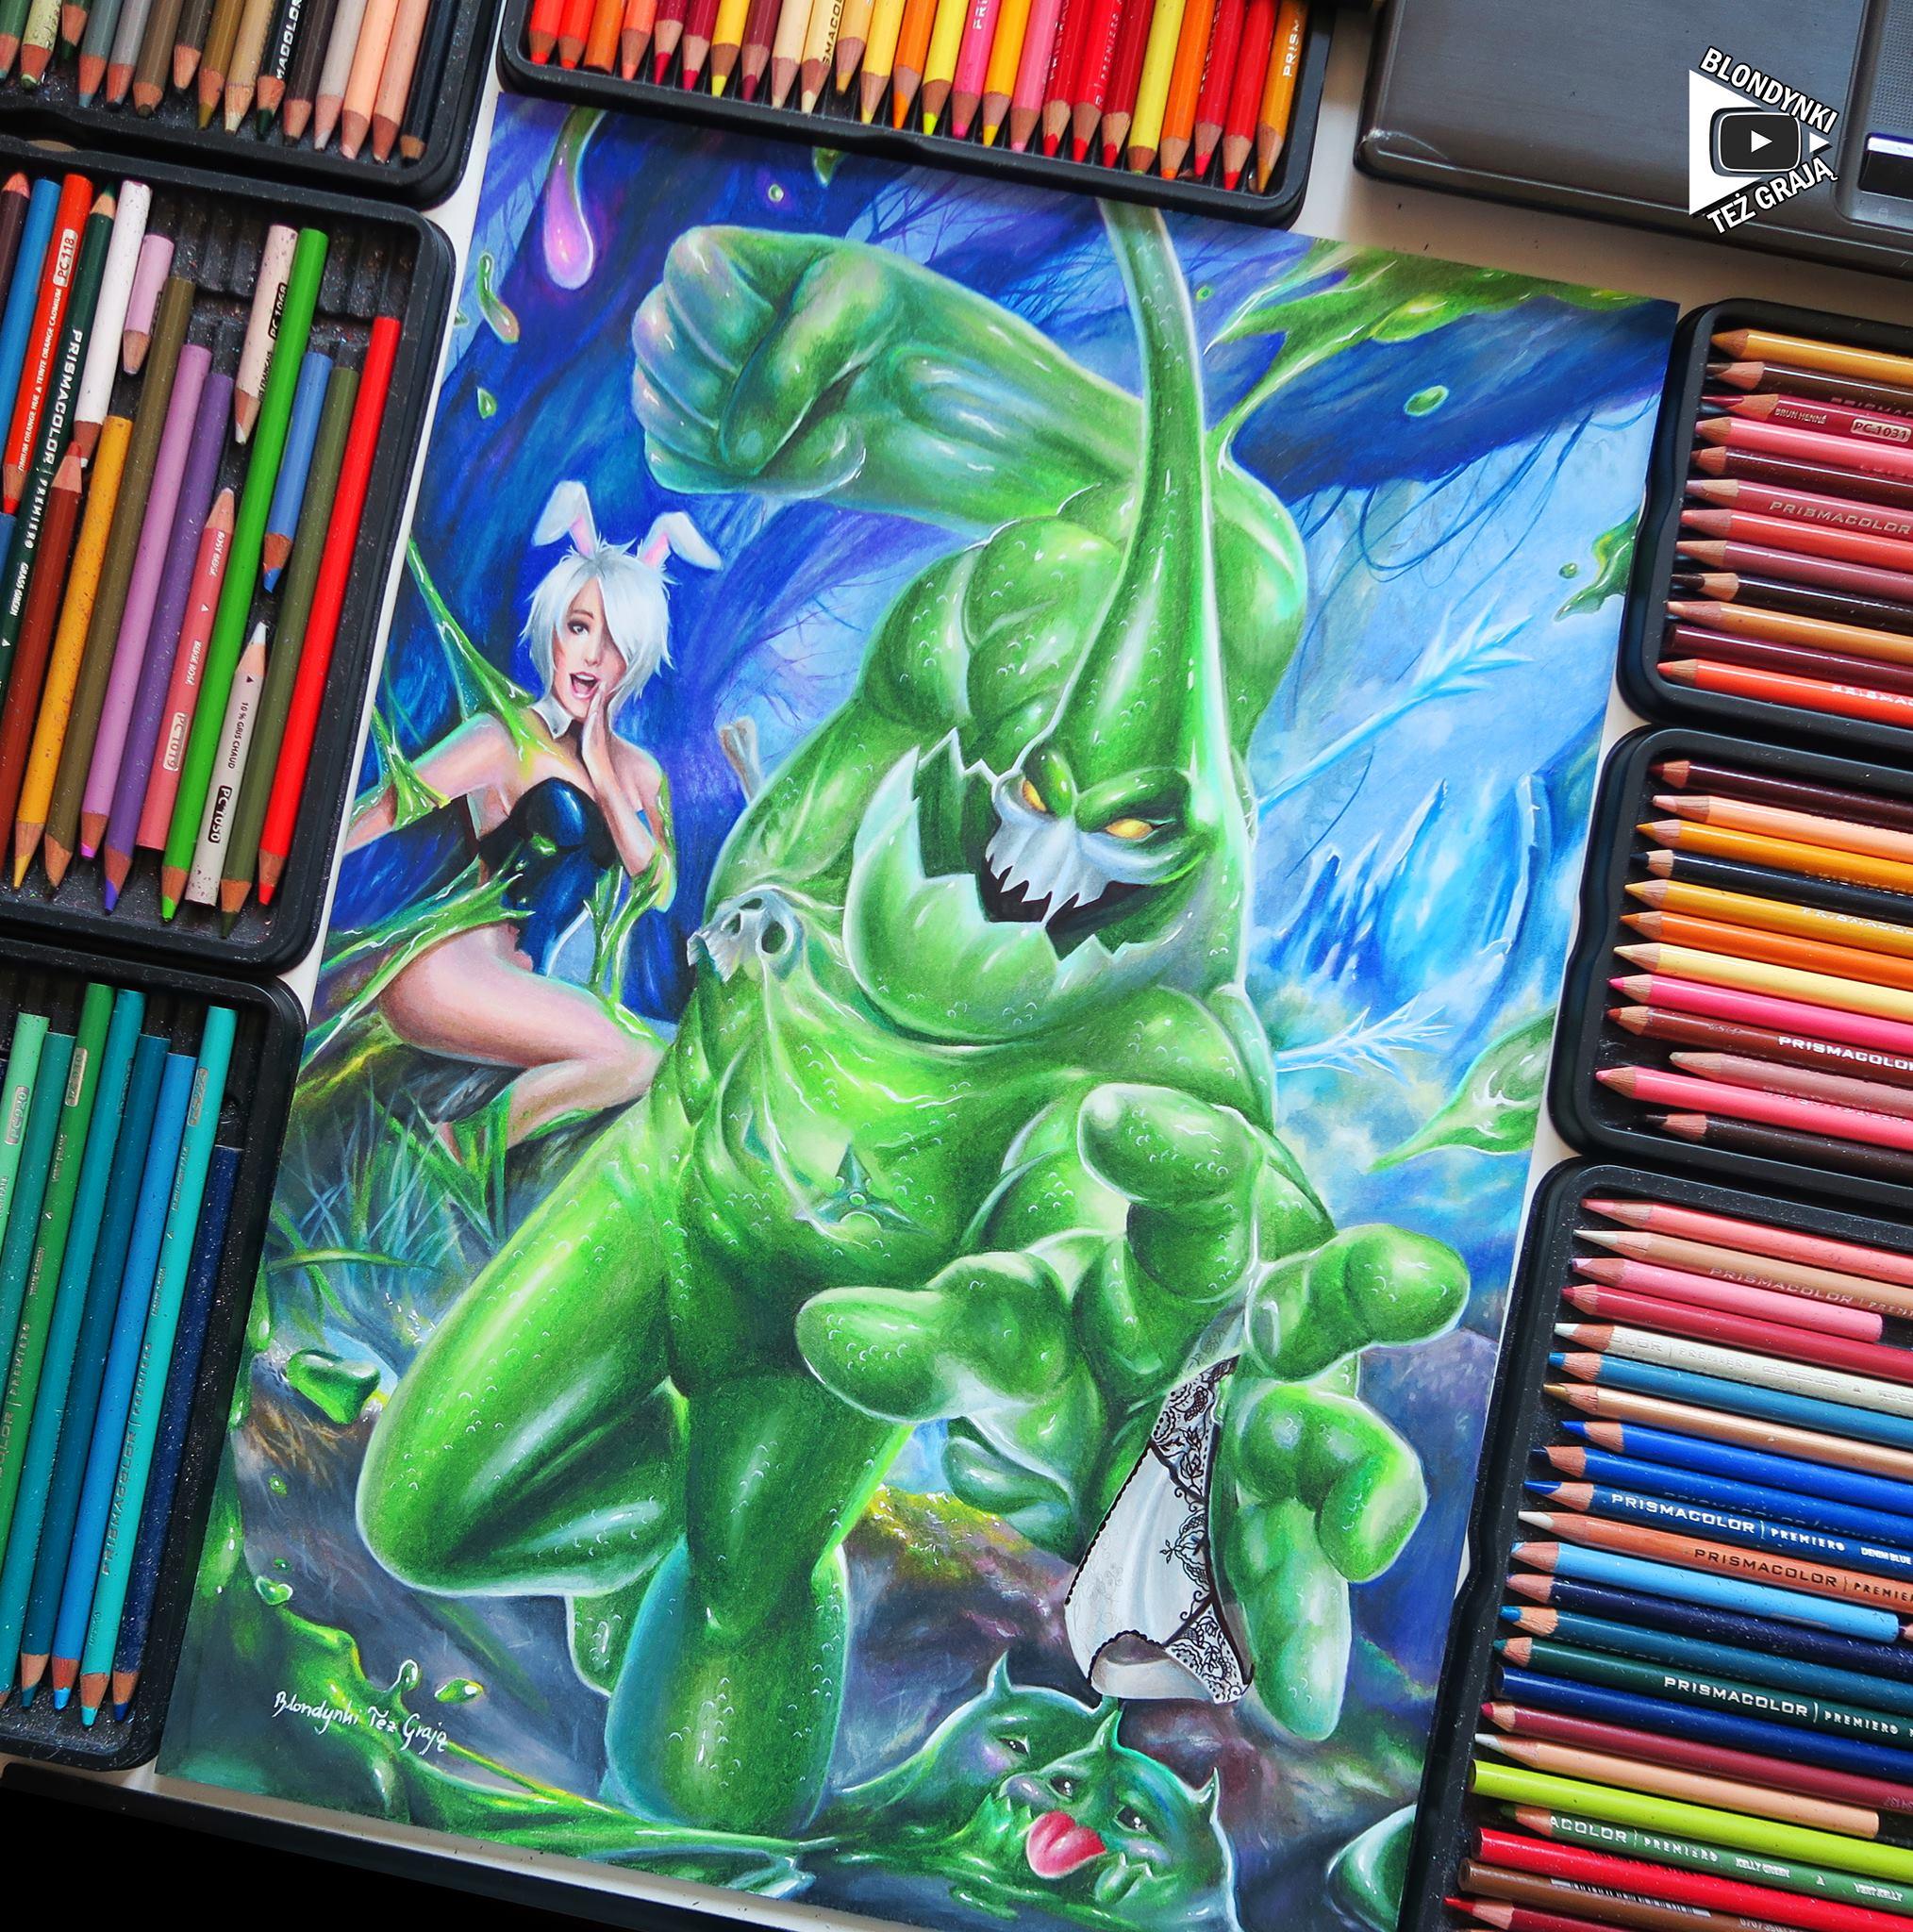 Zac drawing by Blondynki Też Grają - League of Legends art